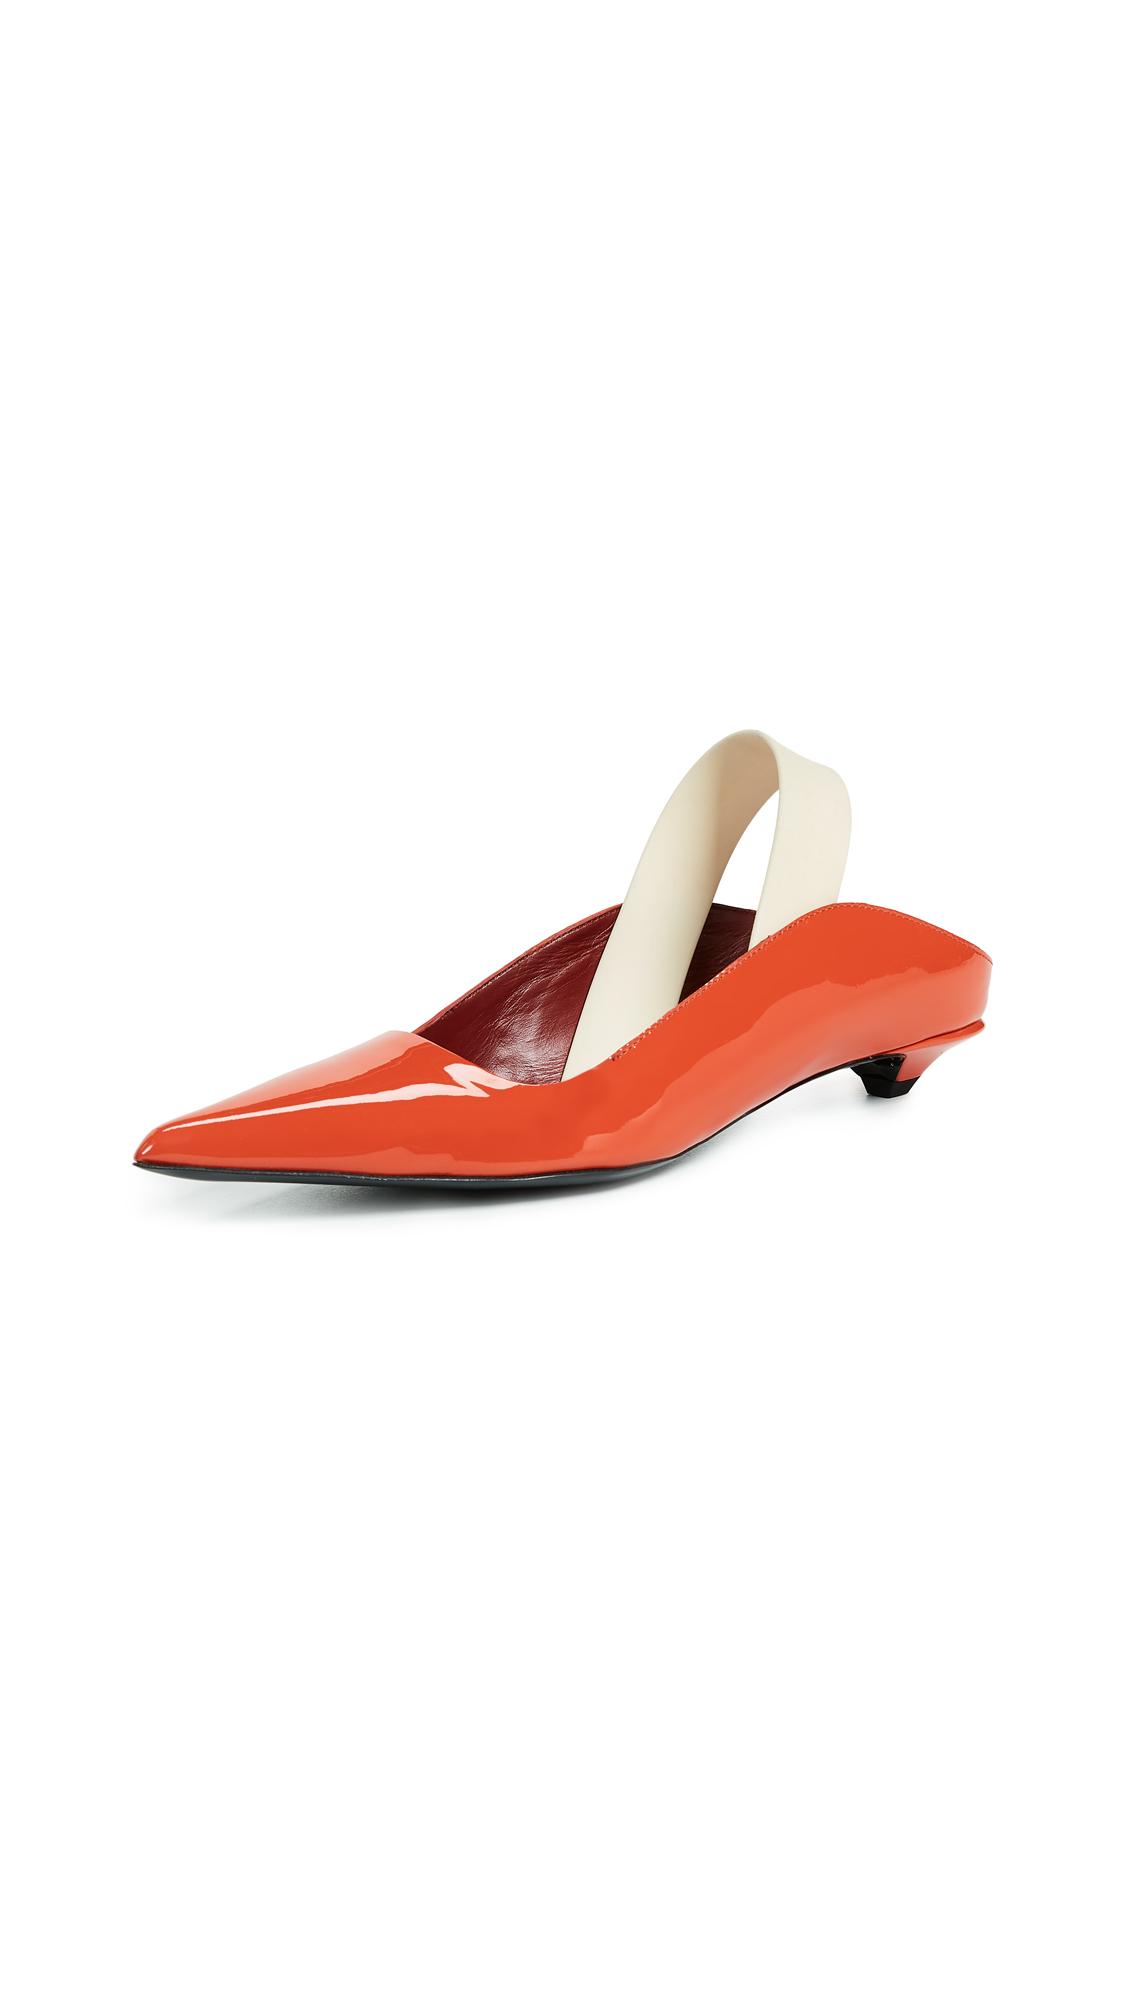 Proenza Schouler Rubber Strap Kitten Heel Flats